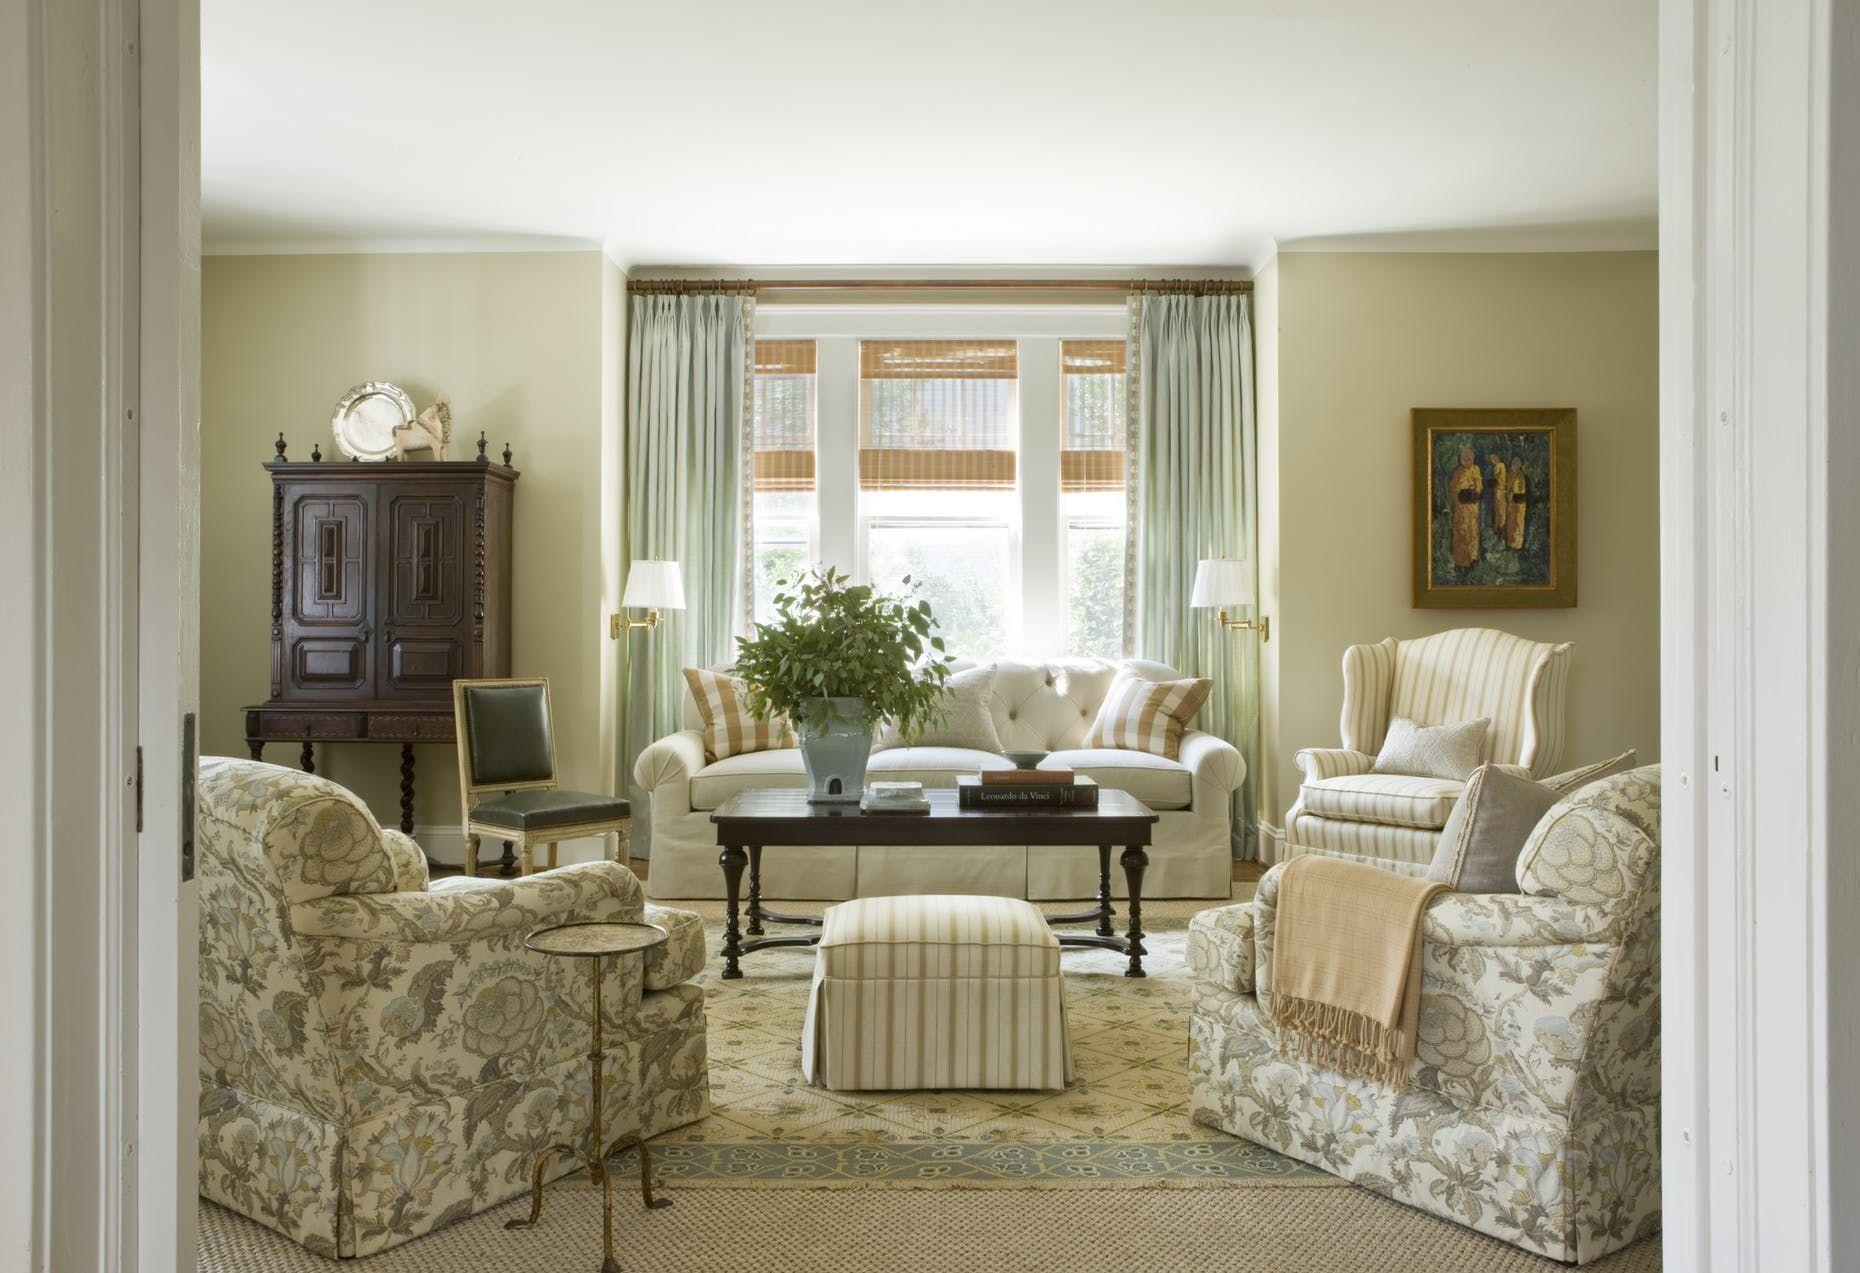 Andrew law interior design portfolio interiors traditional living  room.jpg?ixlib=rails 1.1